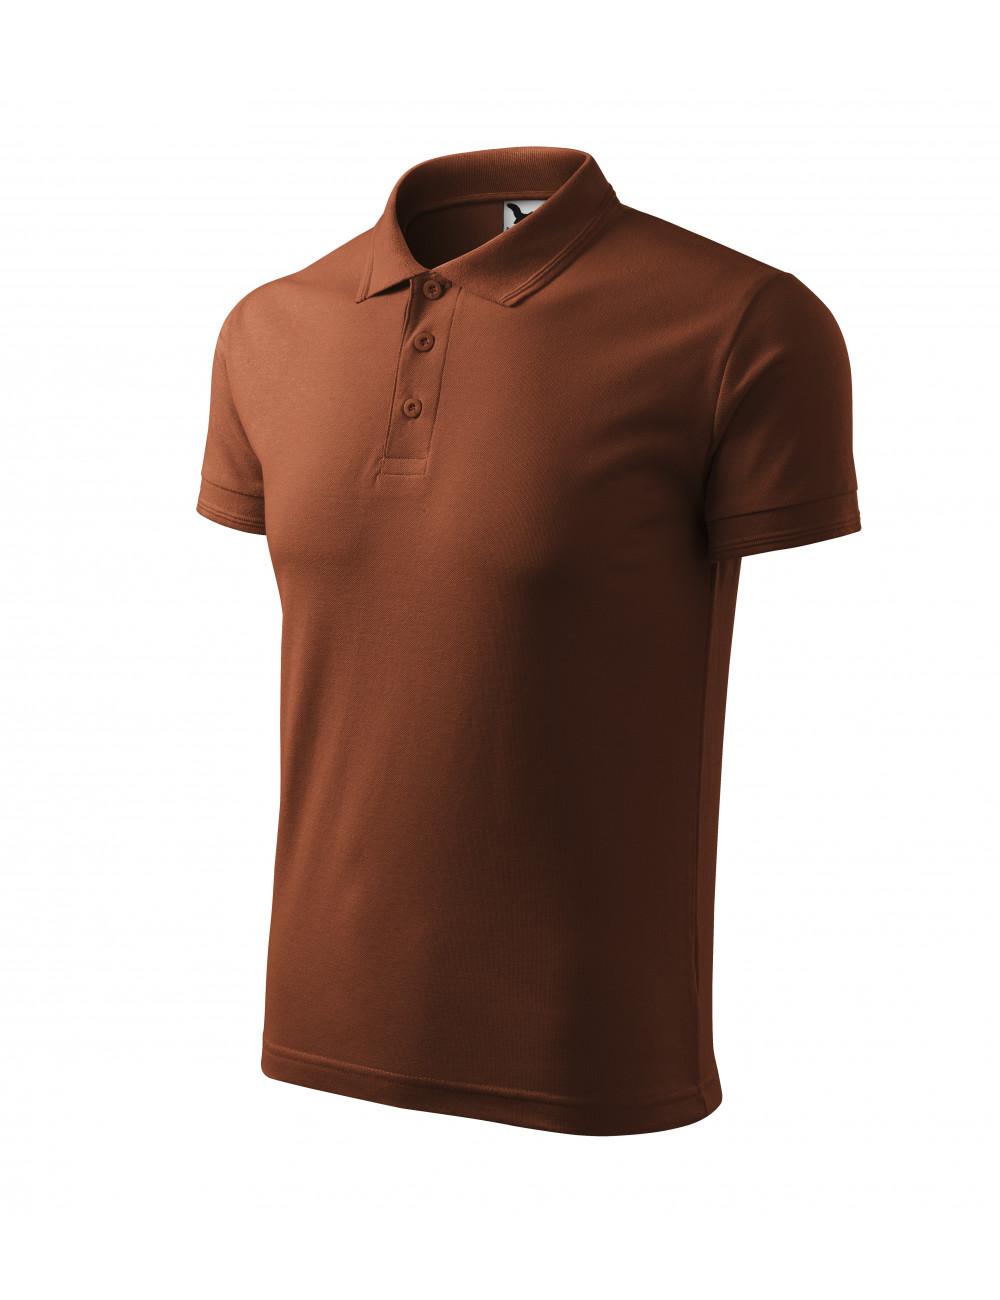 Adler MALFINI Koszulka polo męska Pique Polo 203 czekoladowy